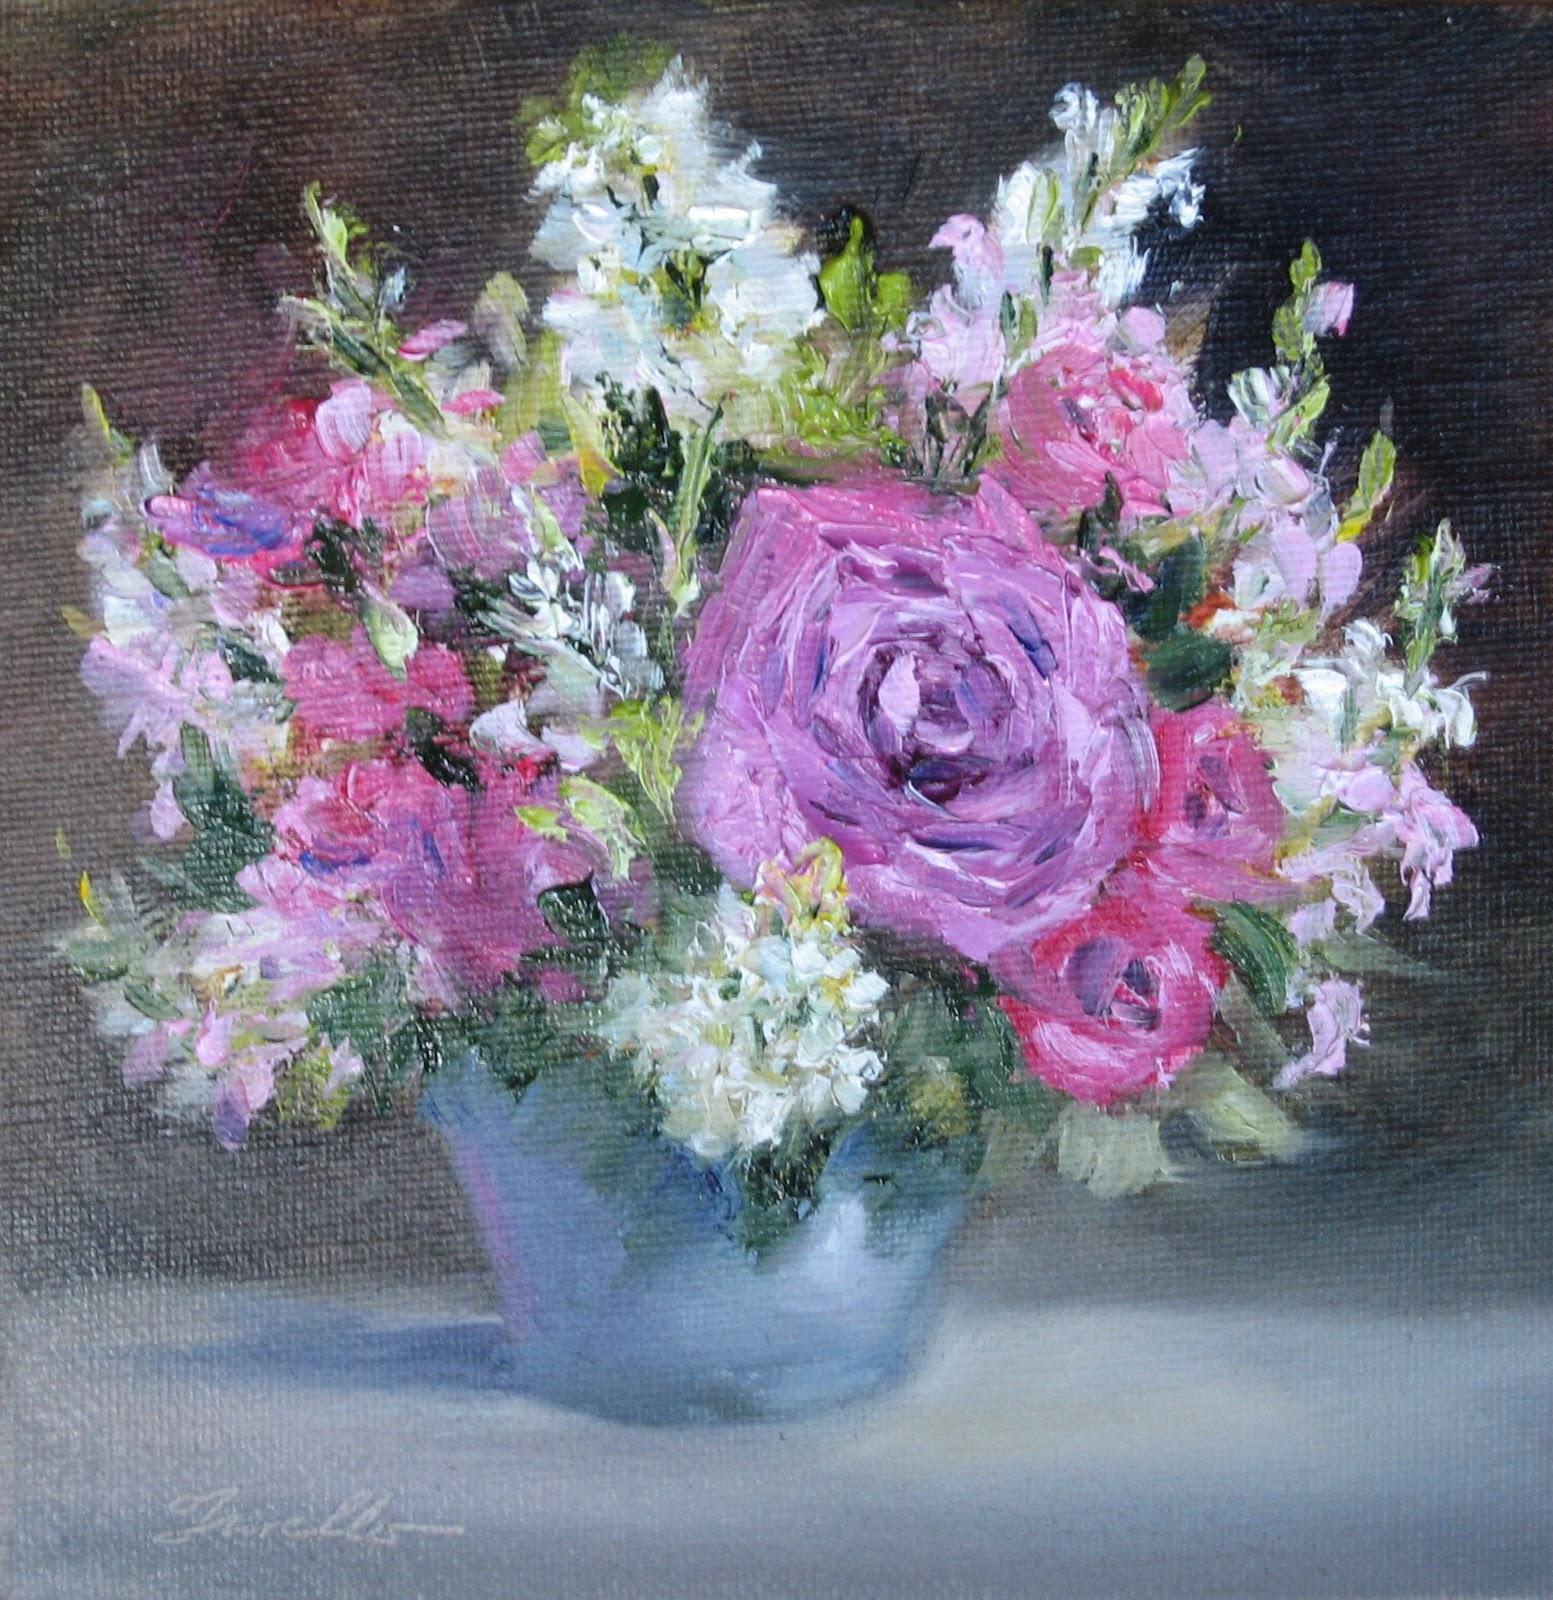 """Flower Study #39"" original fine art by Pat Fiorello"